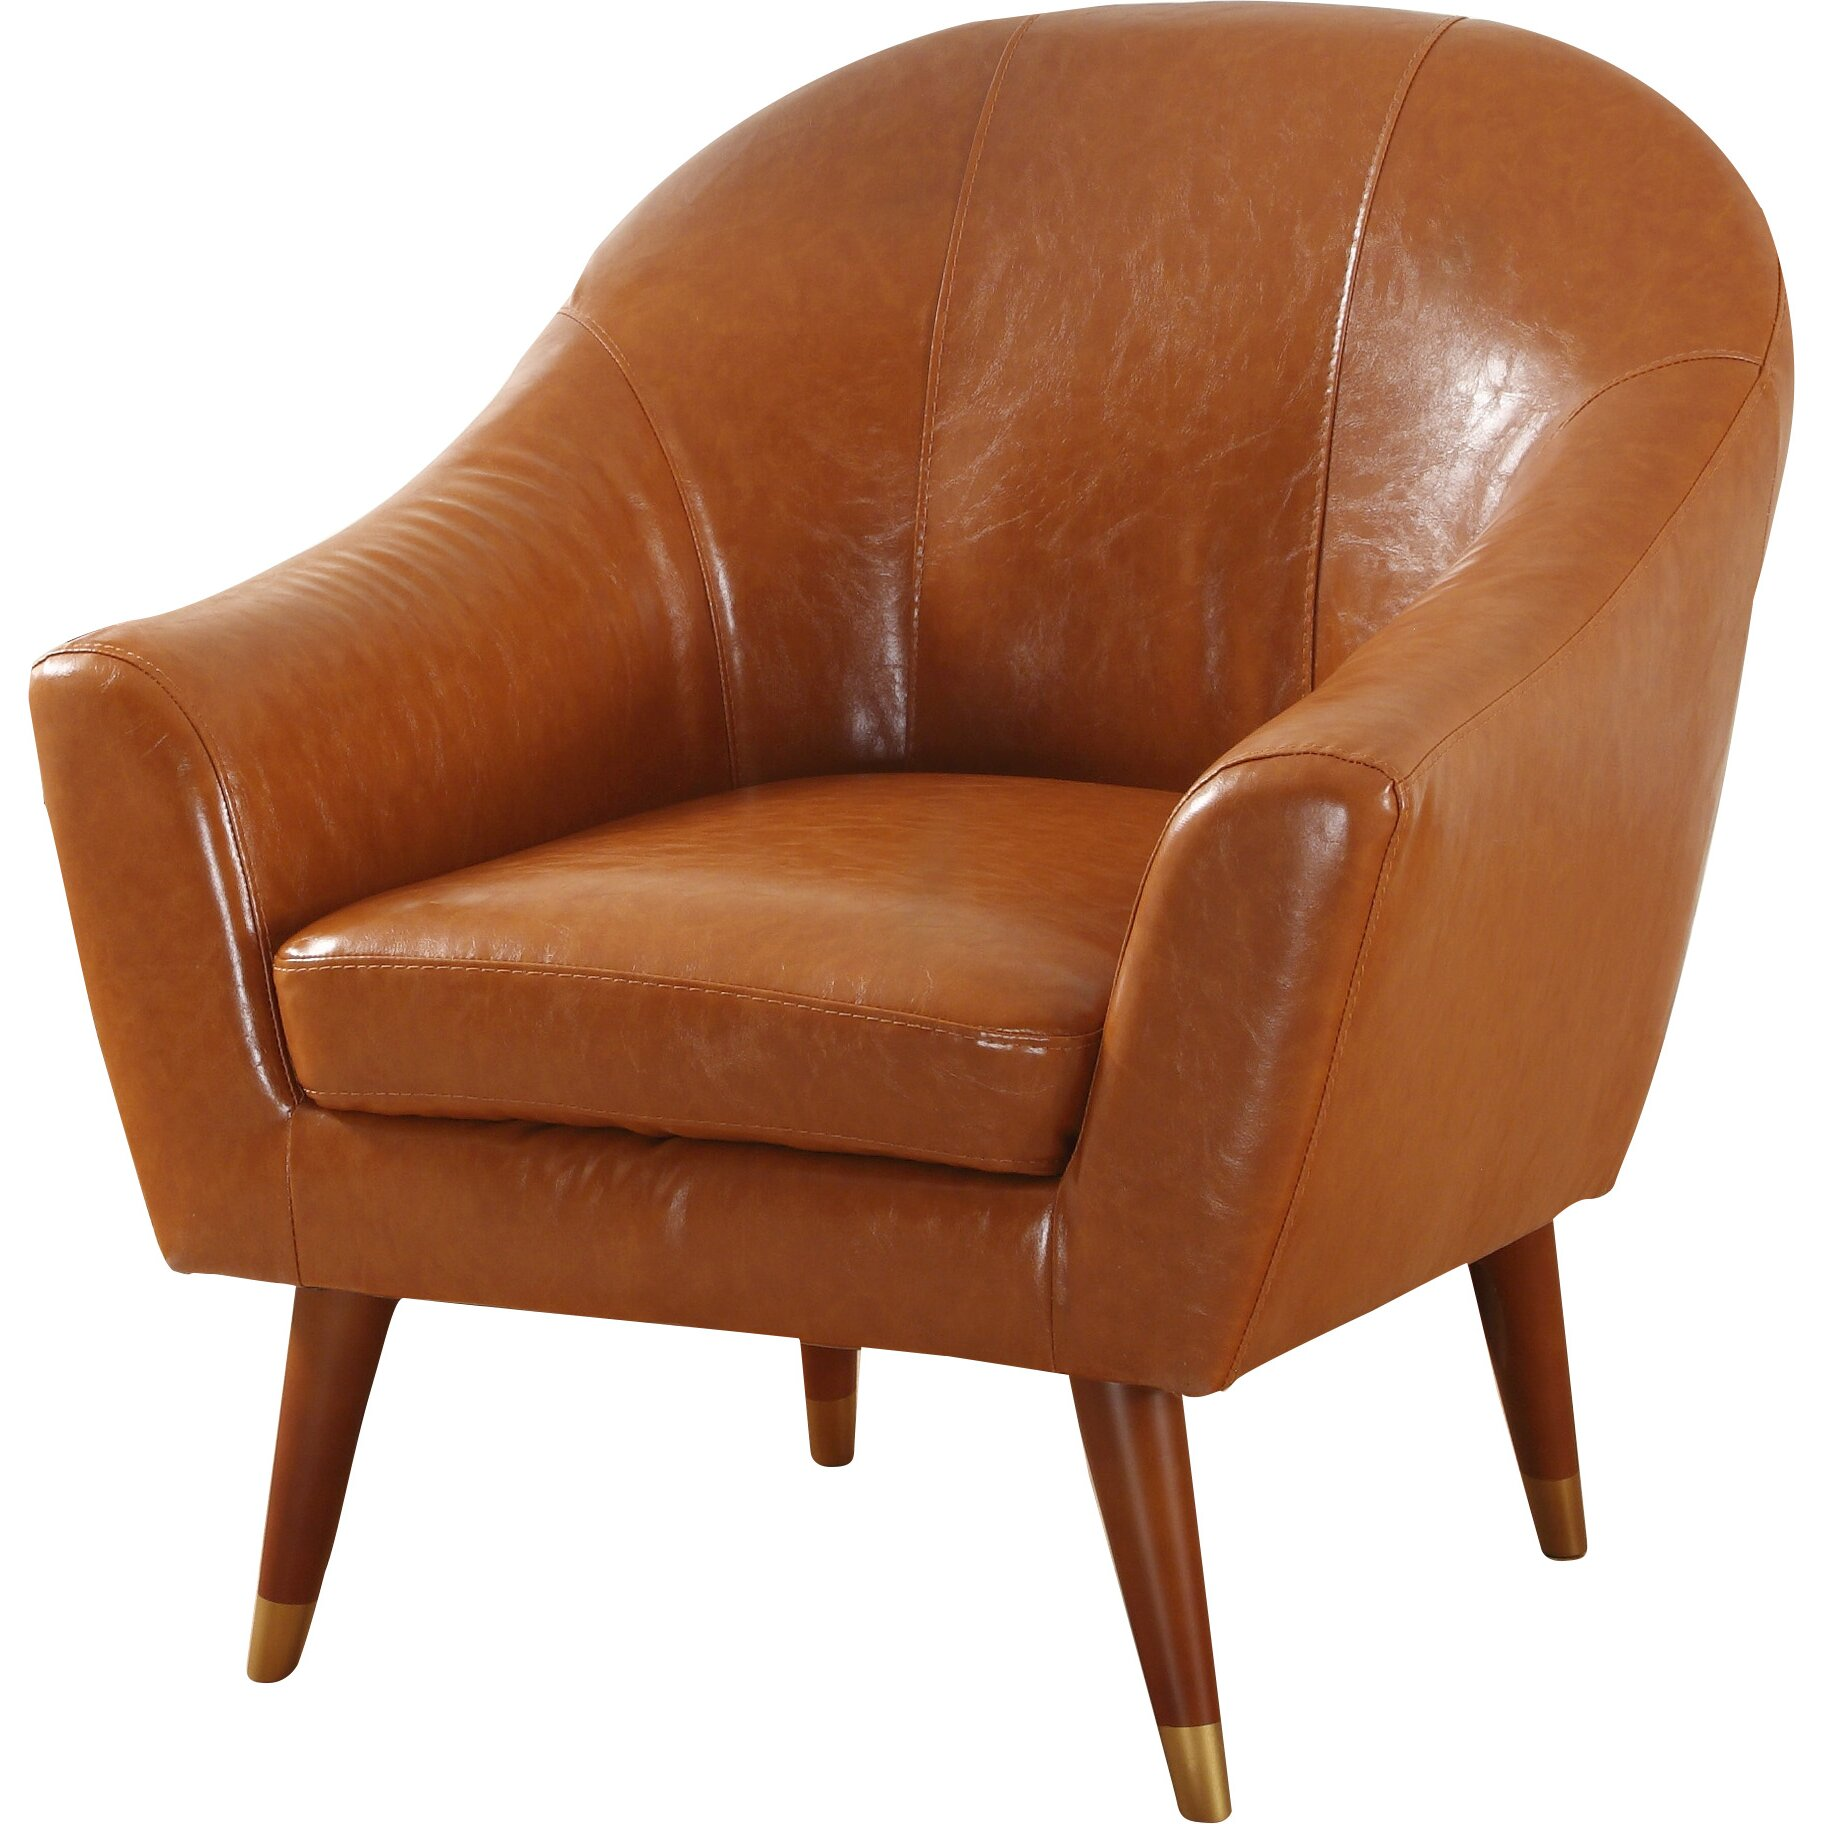 Midcentury Modern Armchair: Mid Century Modern Armchair